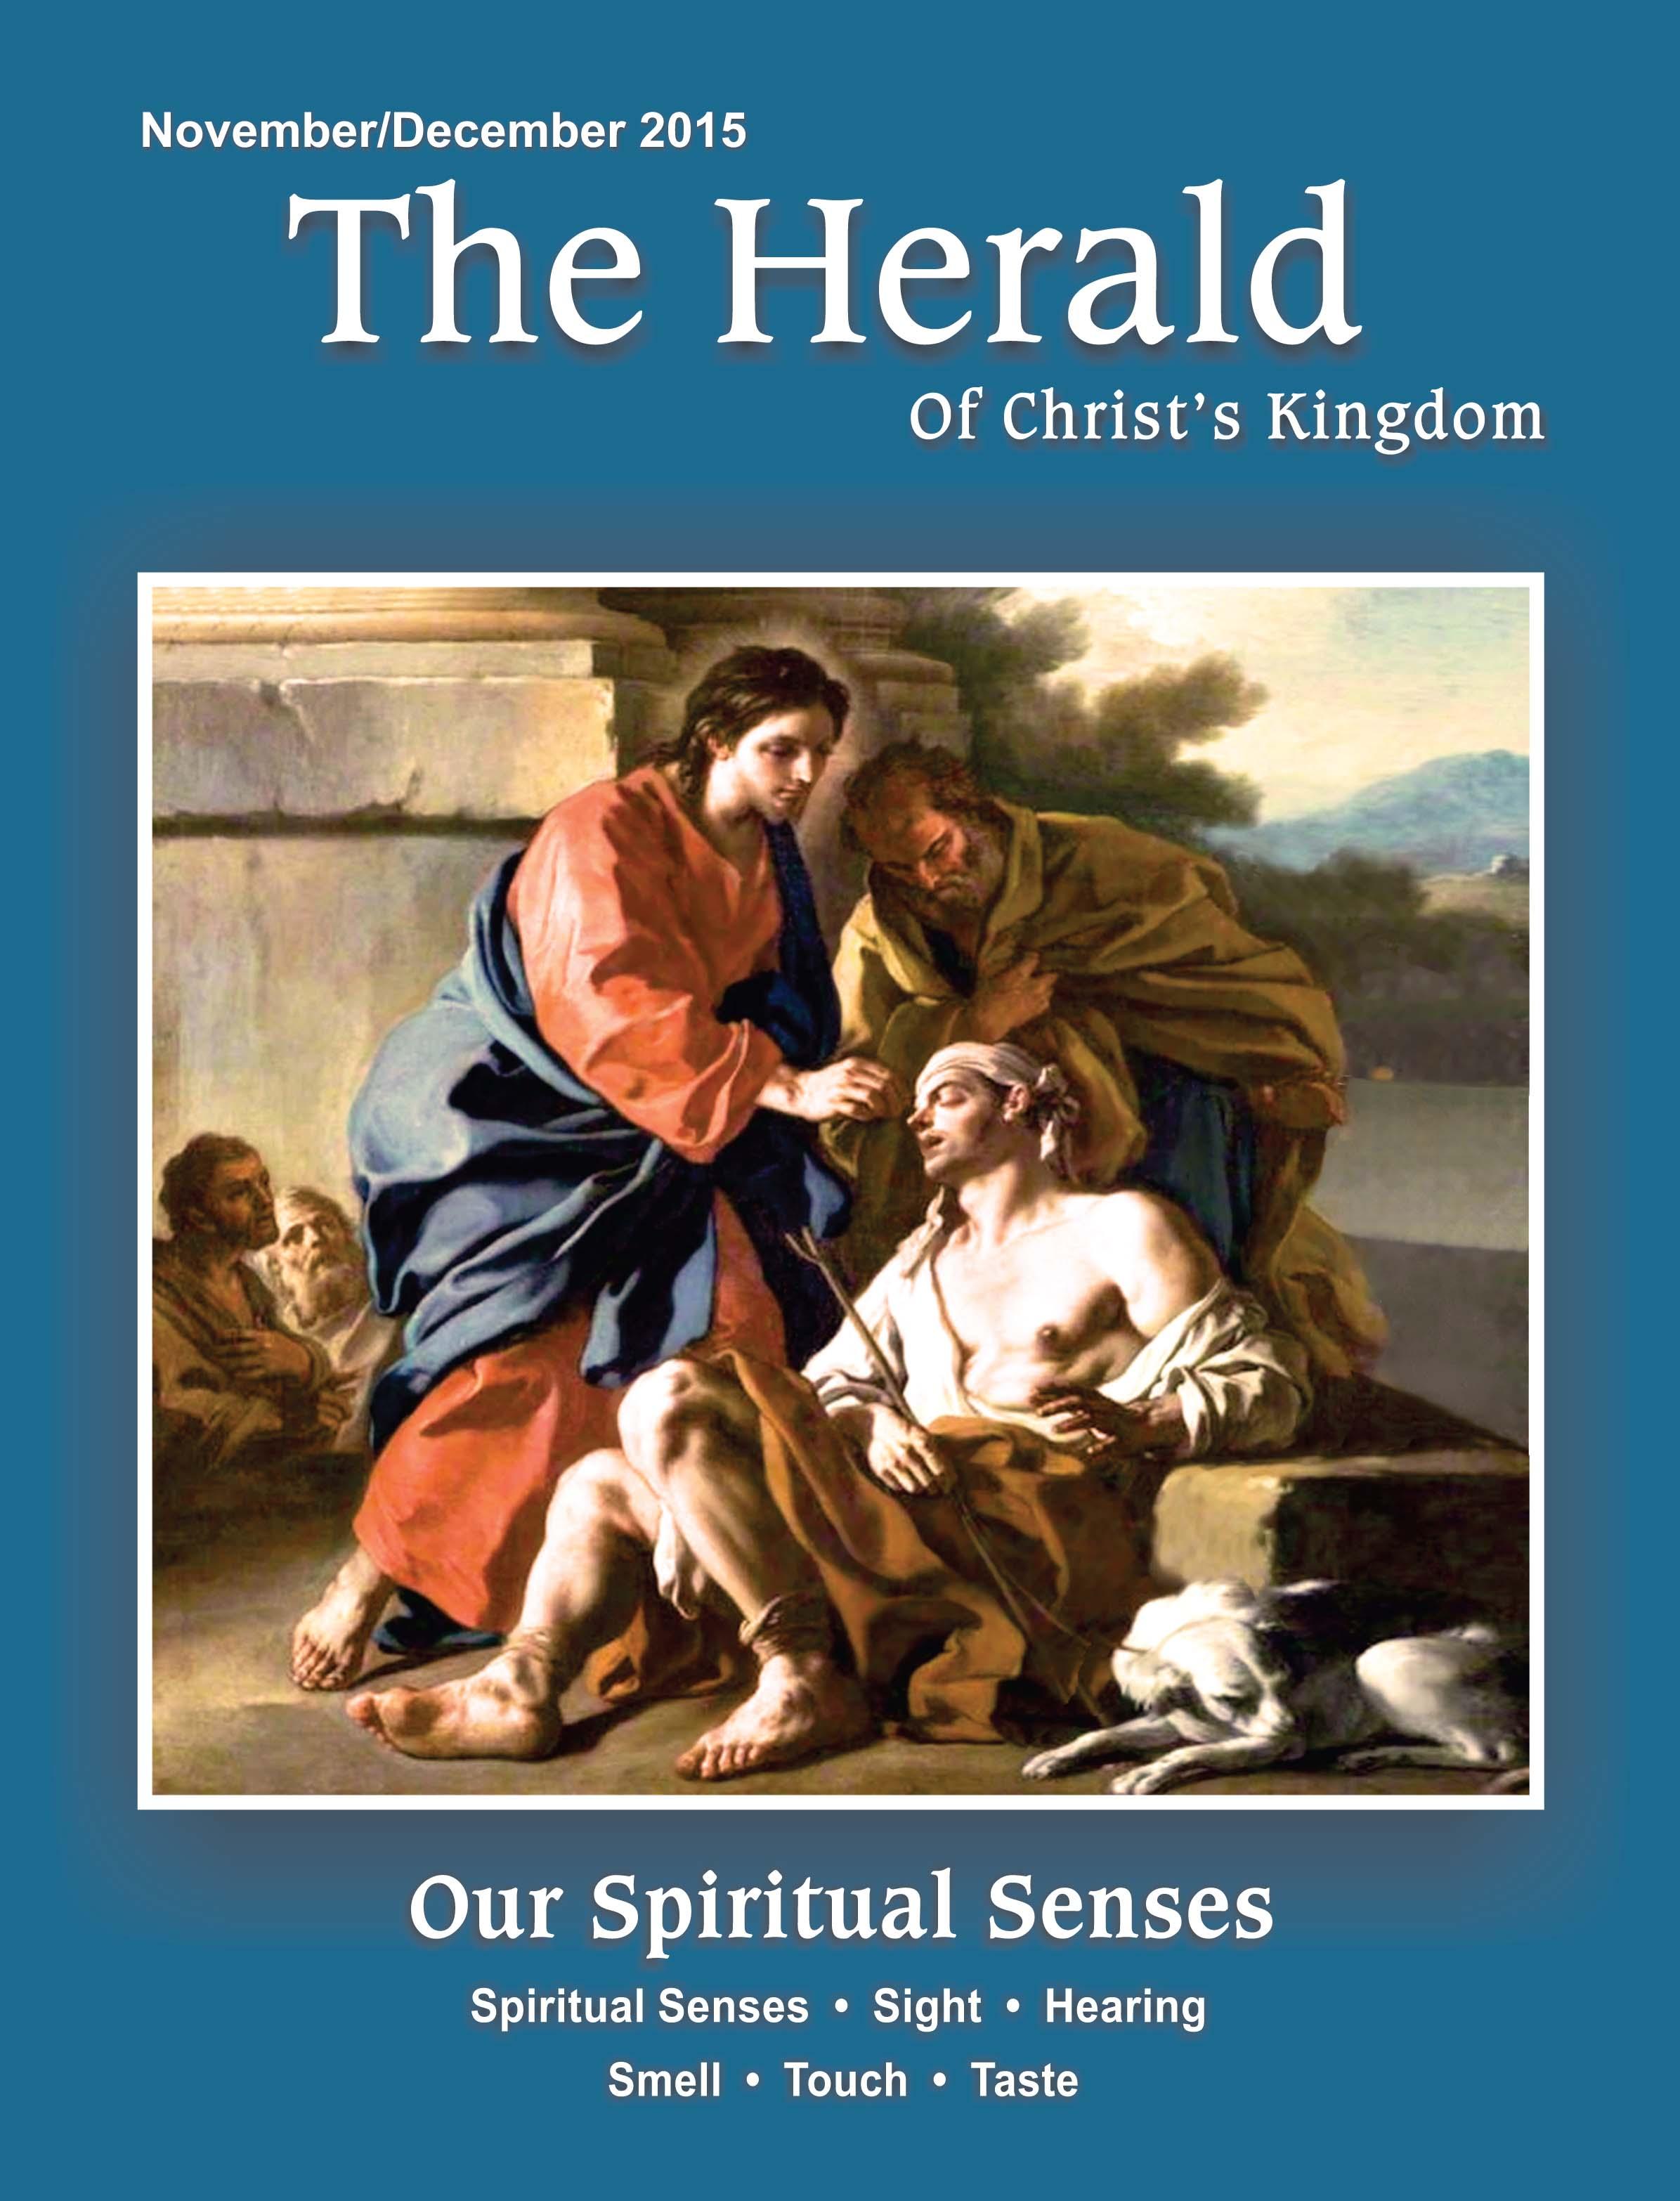 Our Spiritual Senses – The Herald